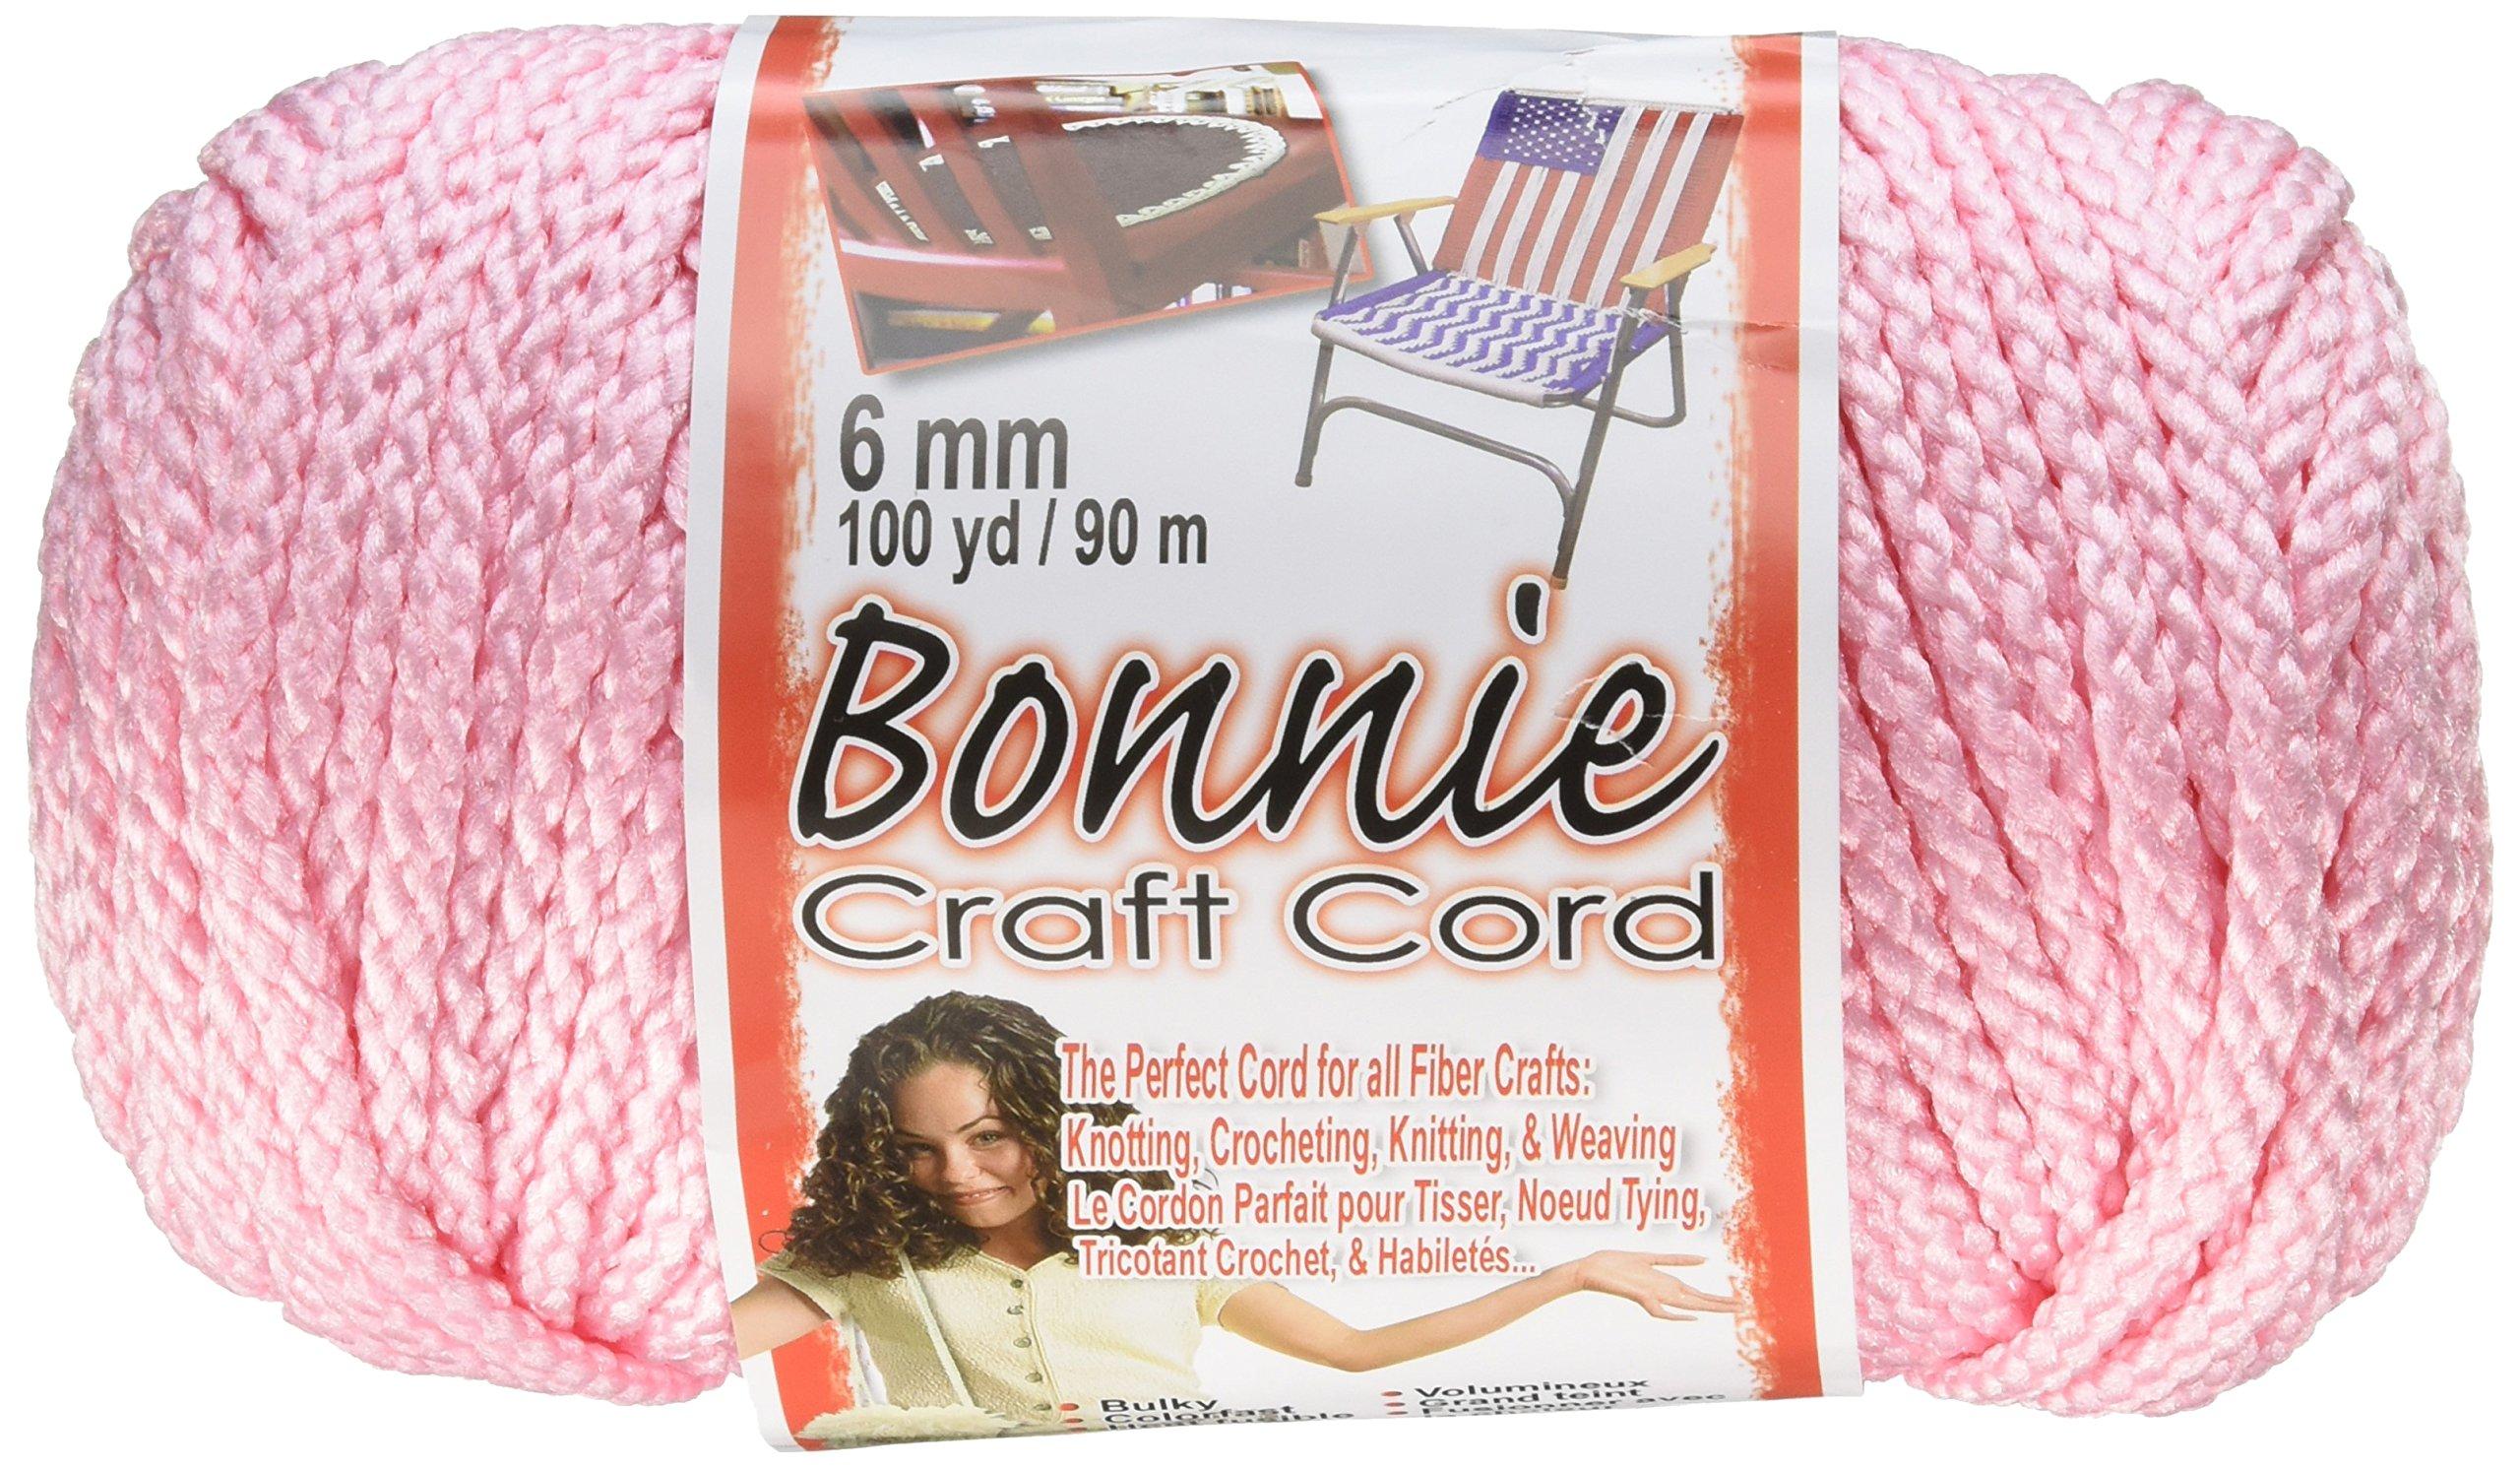 Pepperell 6mm Bonnie Macramé Craft Cord, 100-Yard, Pink